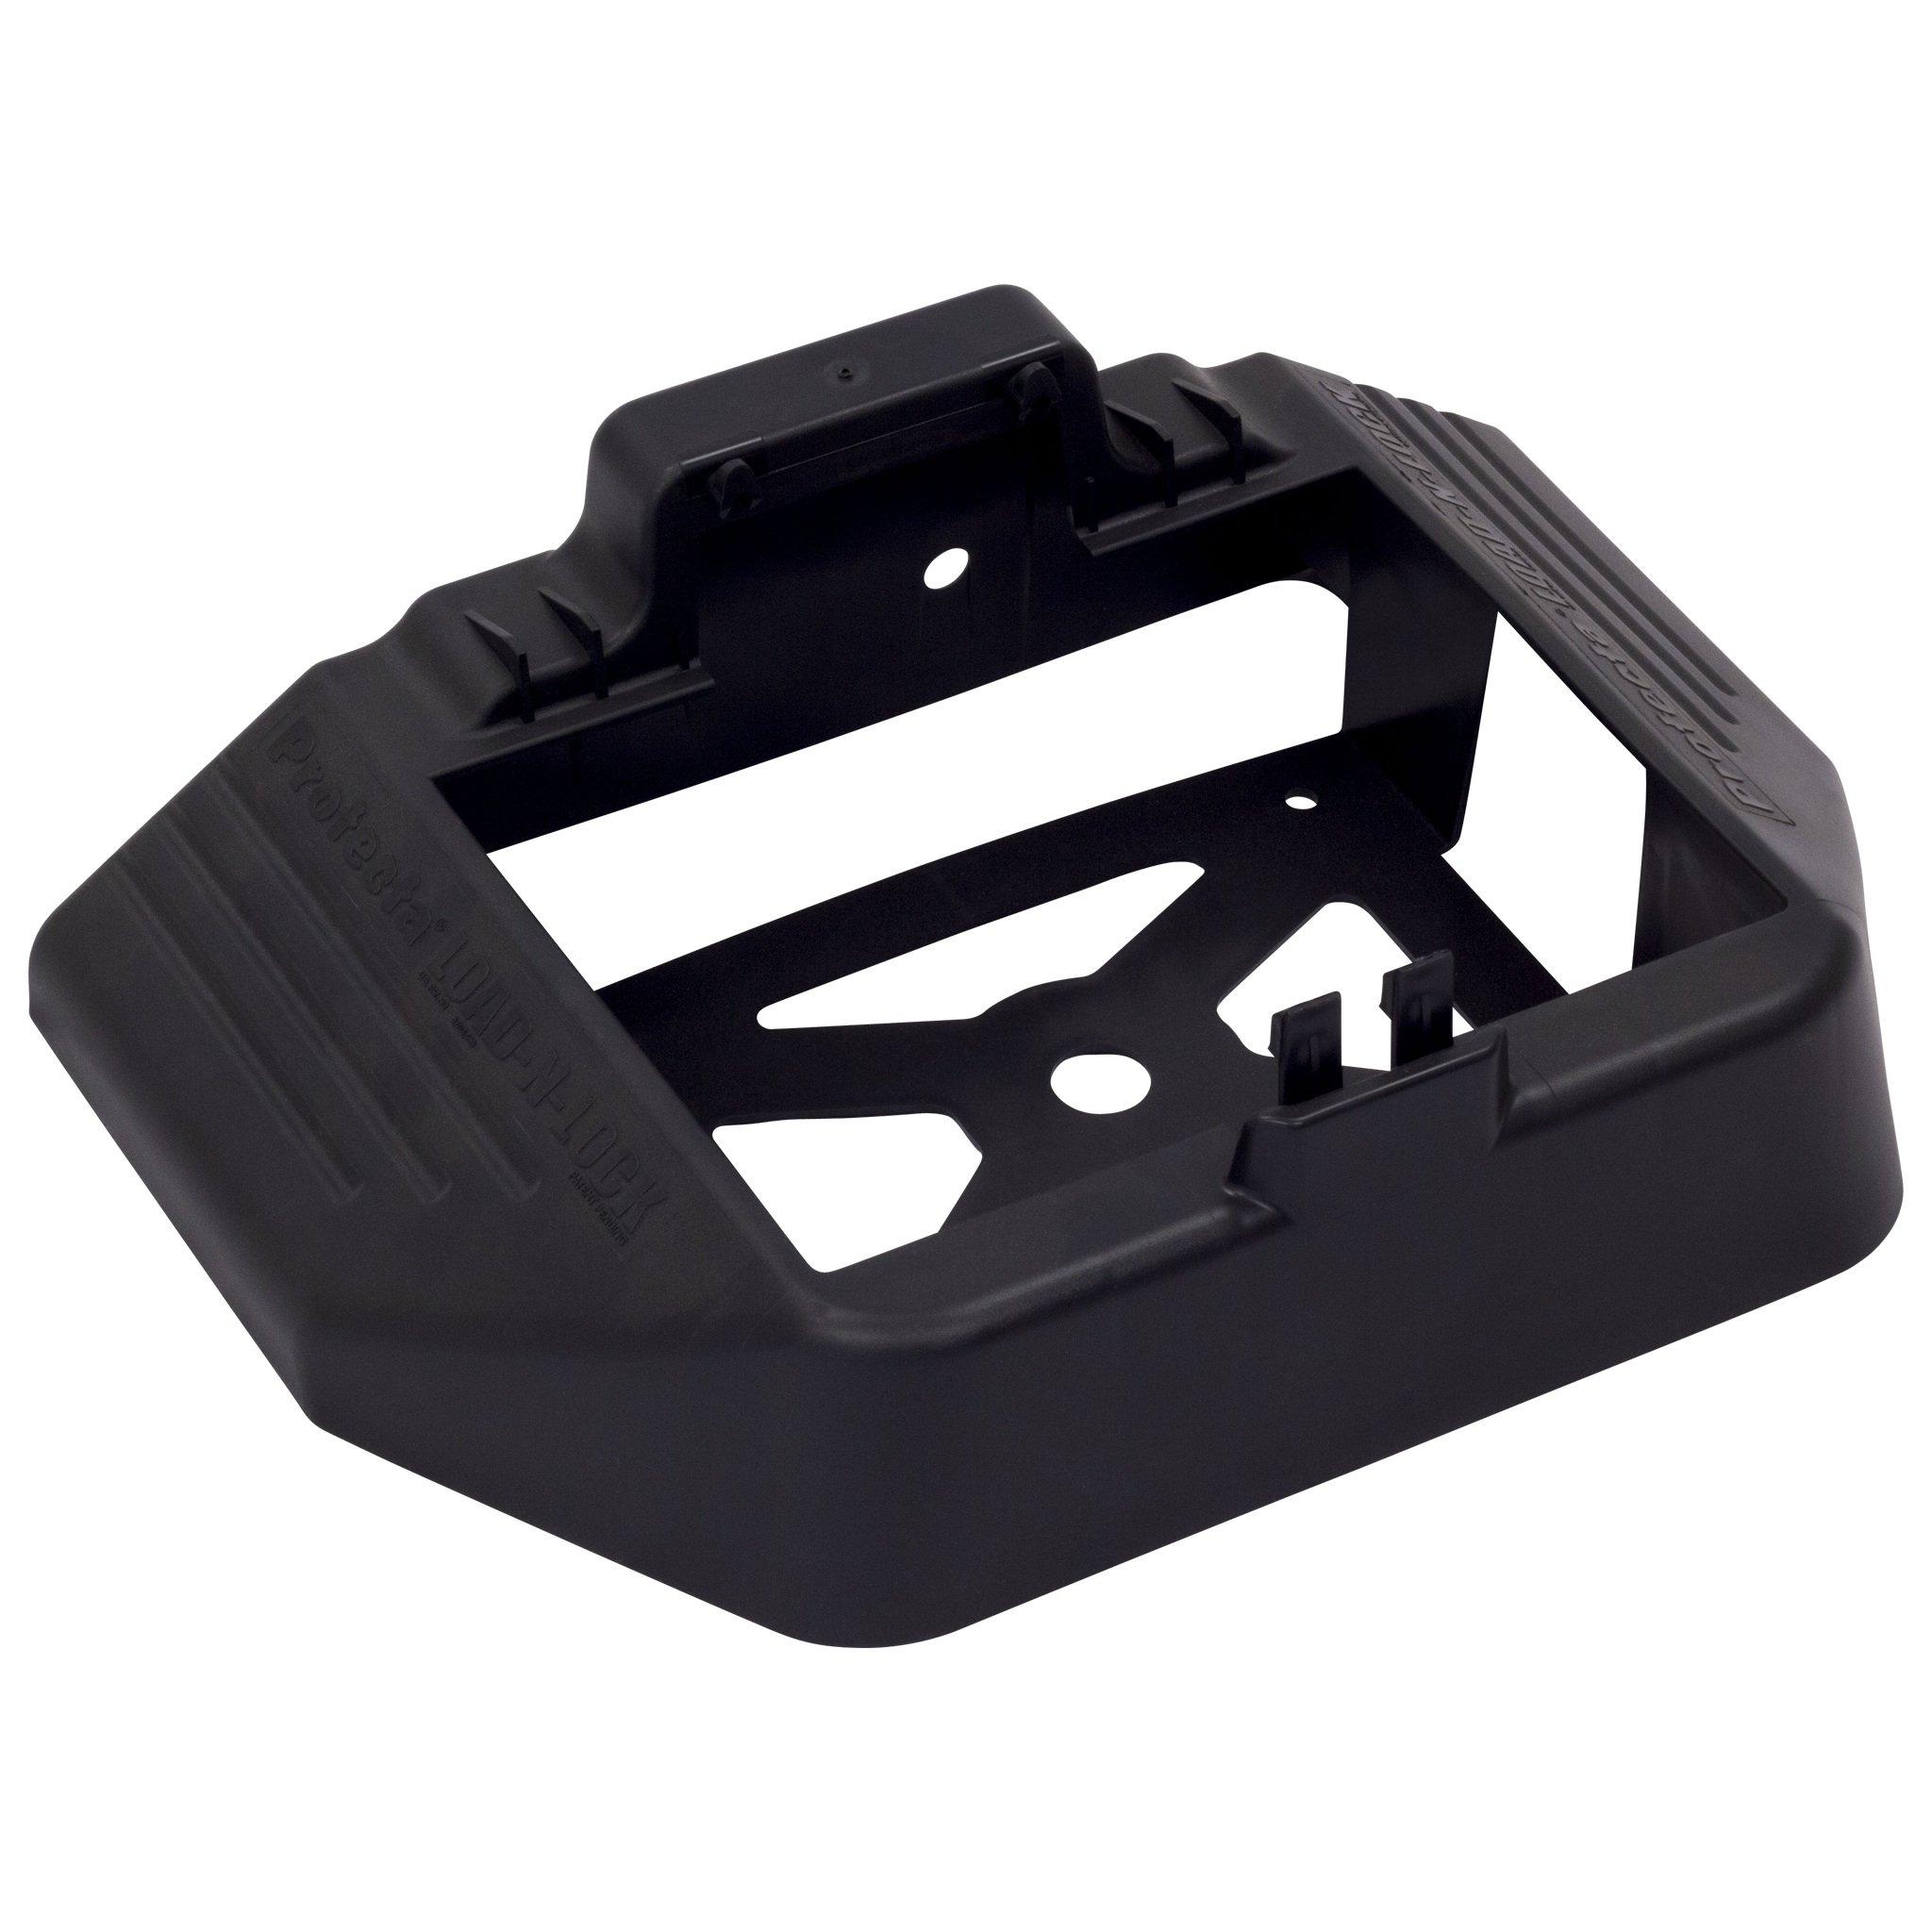 Protecta Load-N-Lock Anchoring System - Protecta Sidekick (6 Systems)